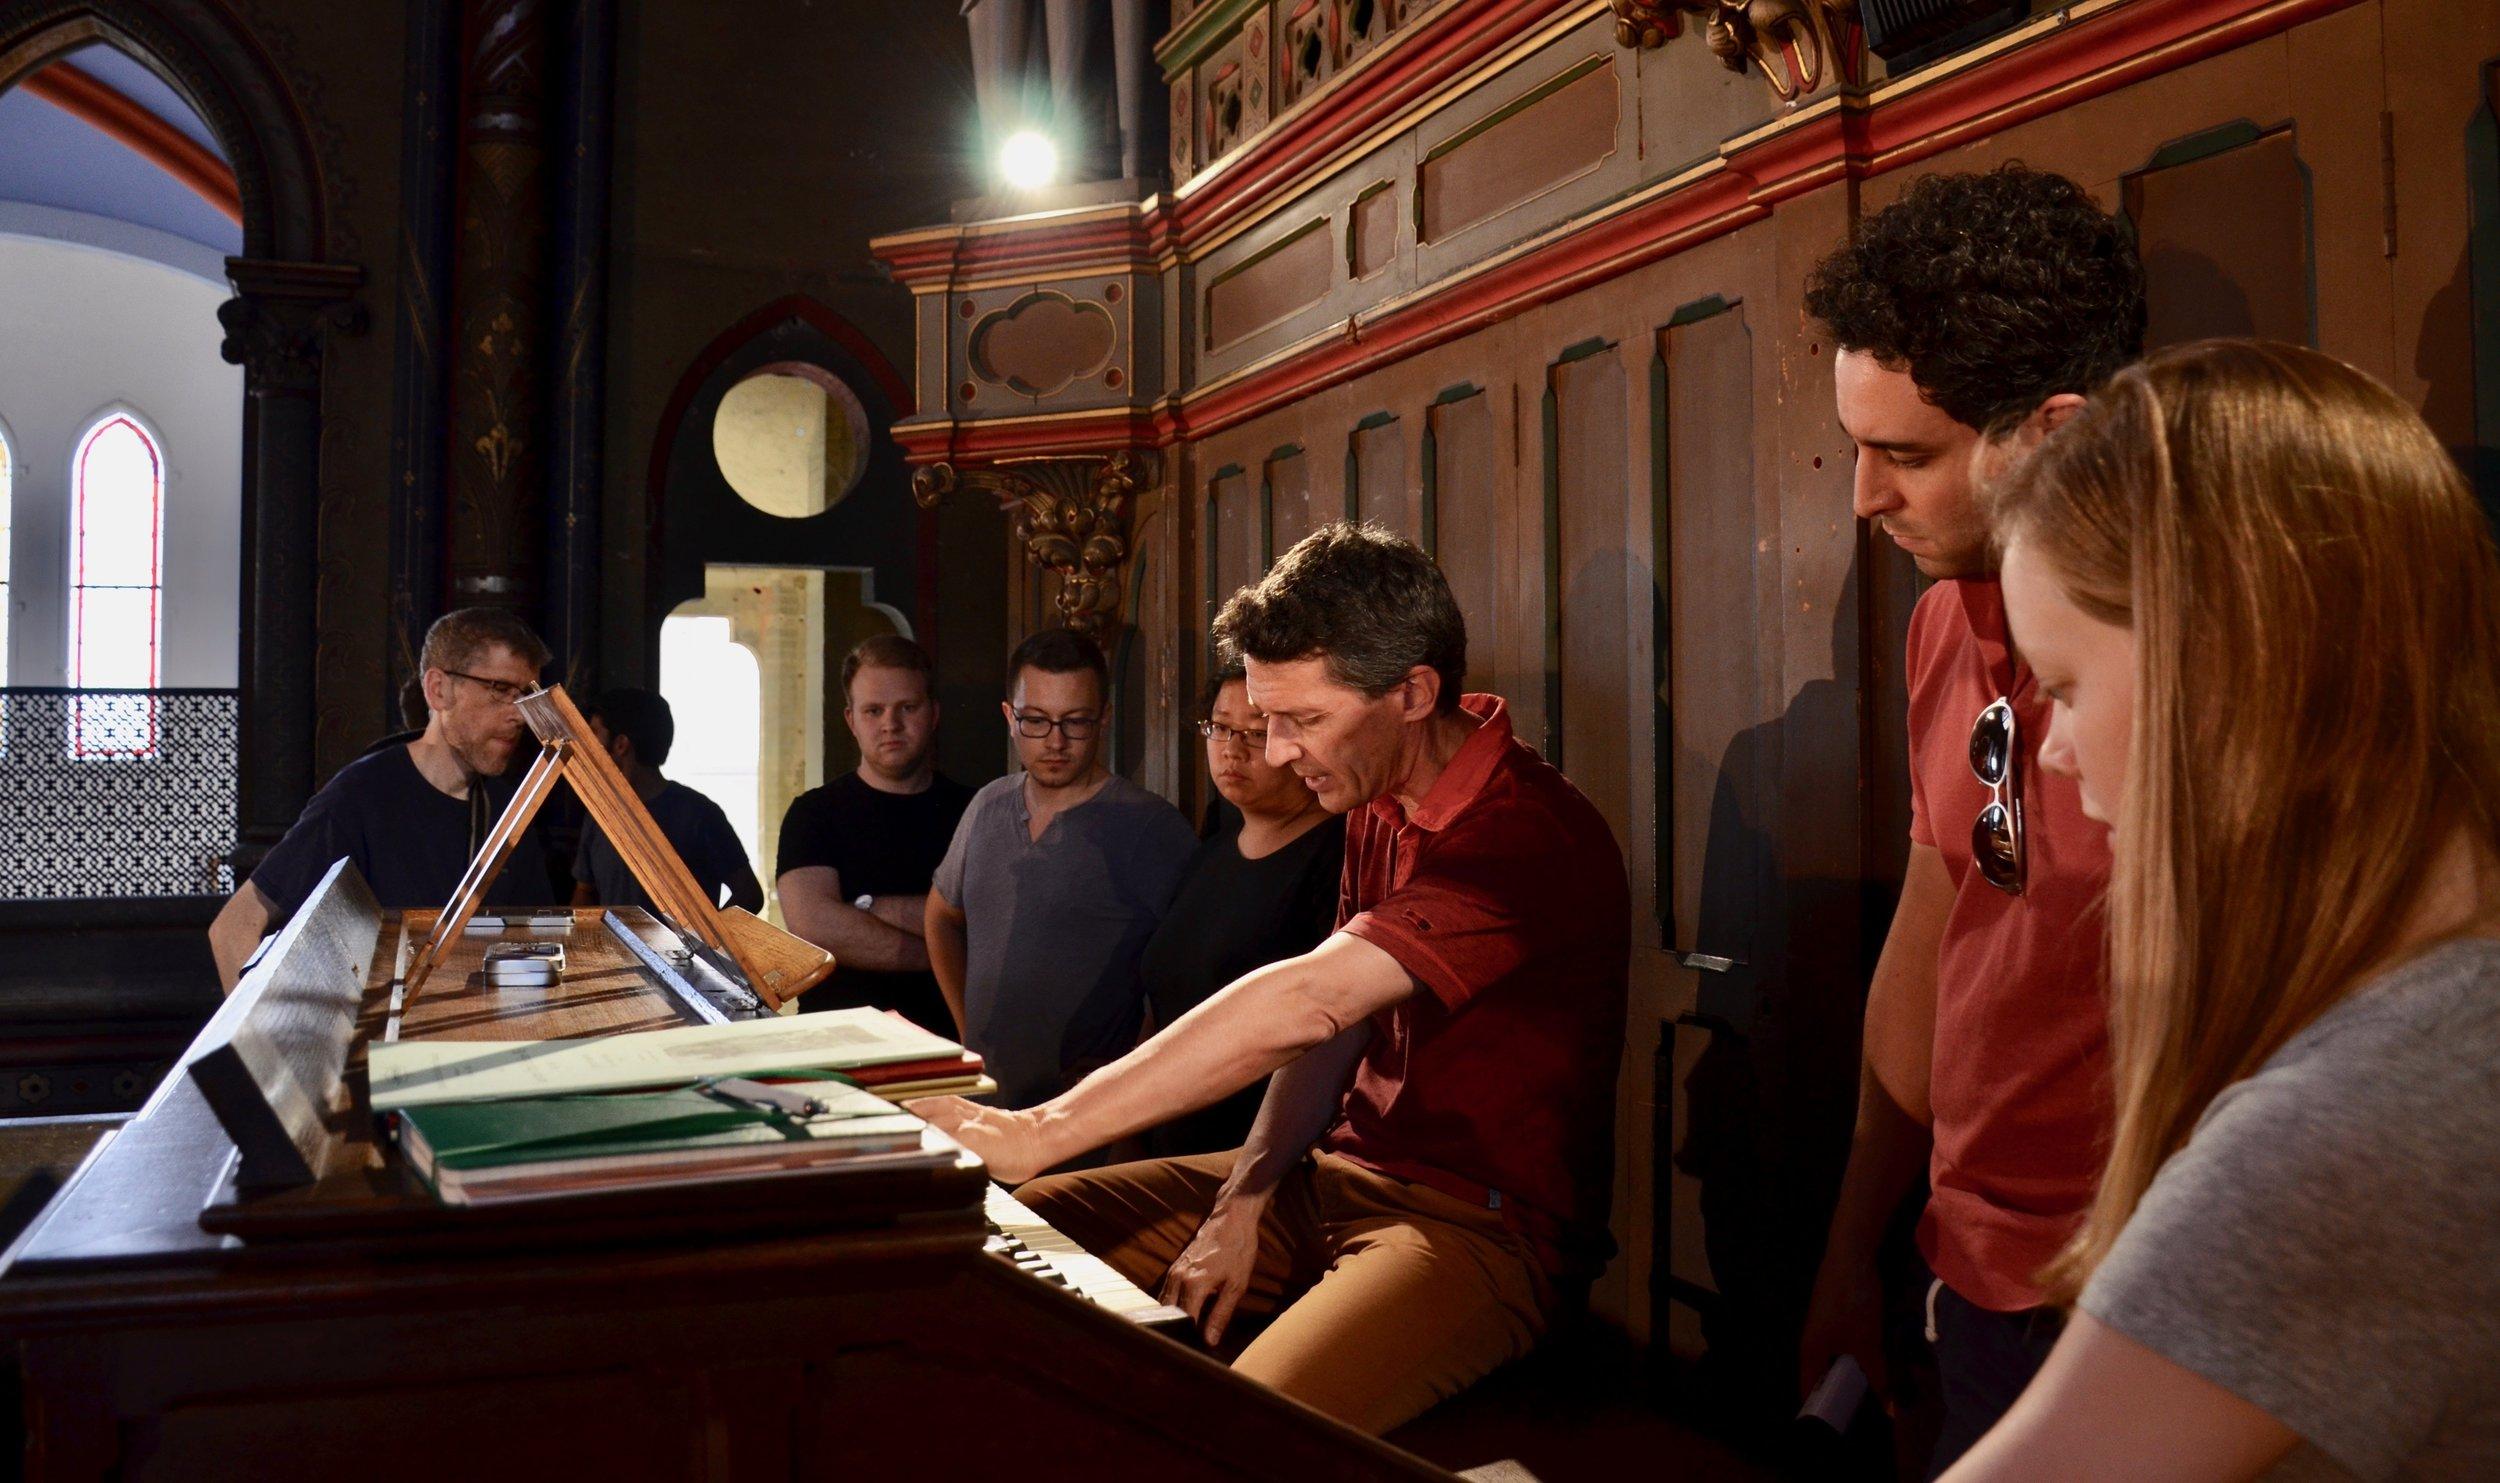 Yves Rechsteiner demonstrates the Cavaillé-Coll organ in Gésu church, Toulouse. Boston Organ Studio